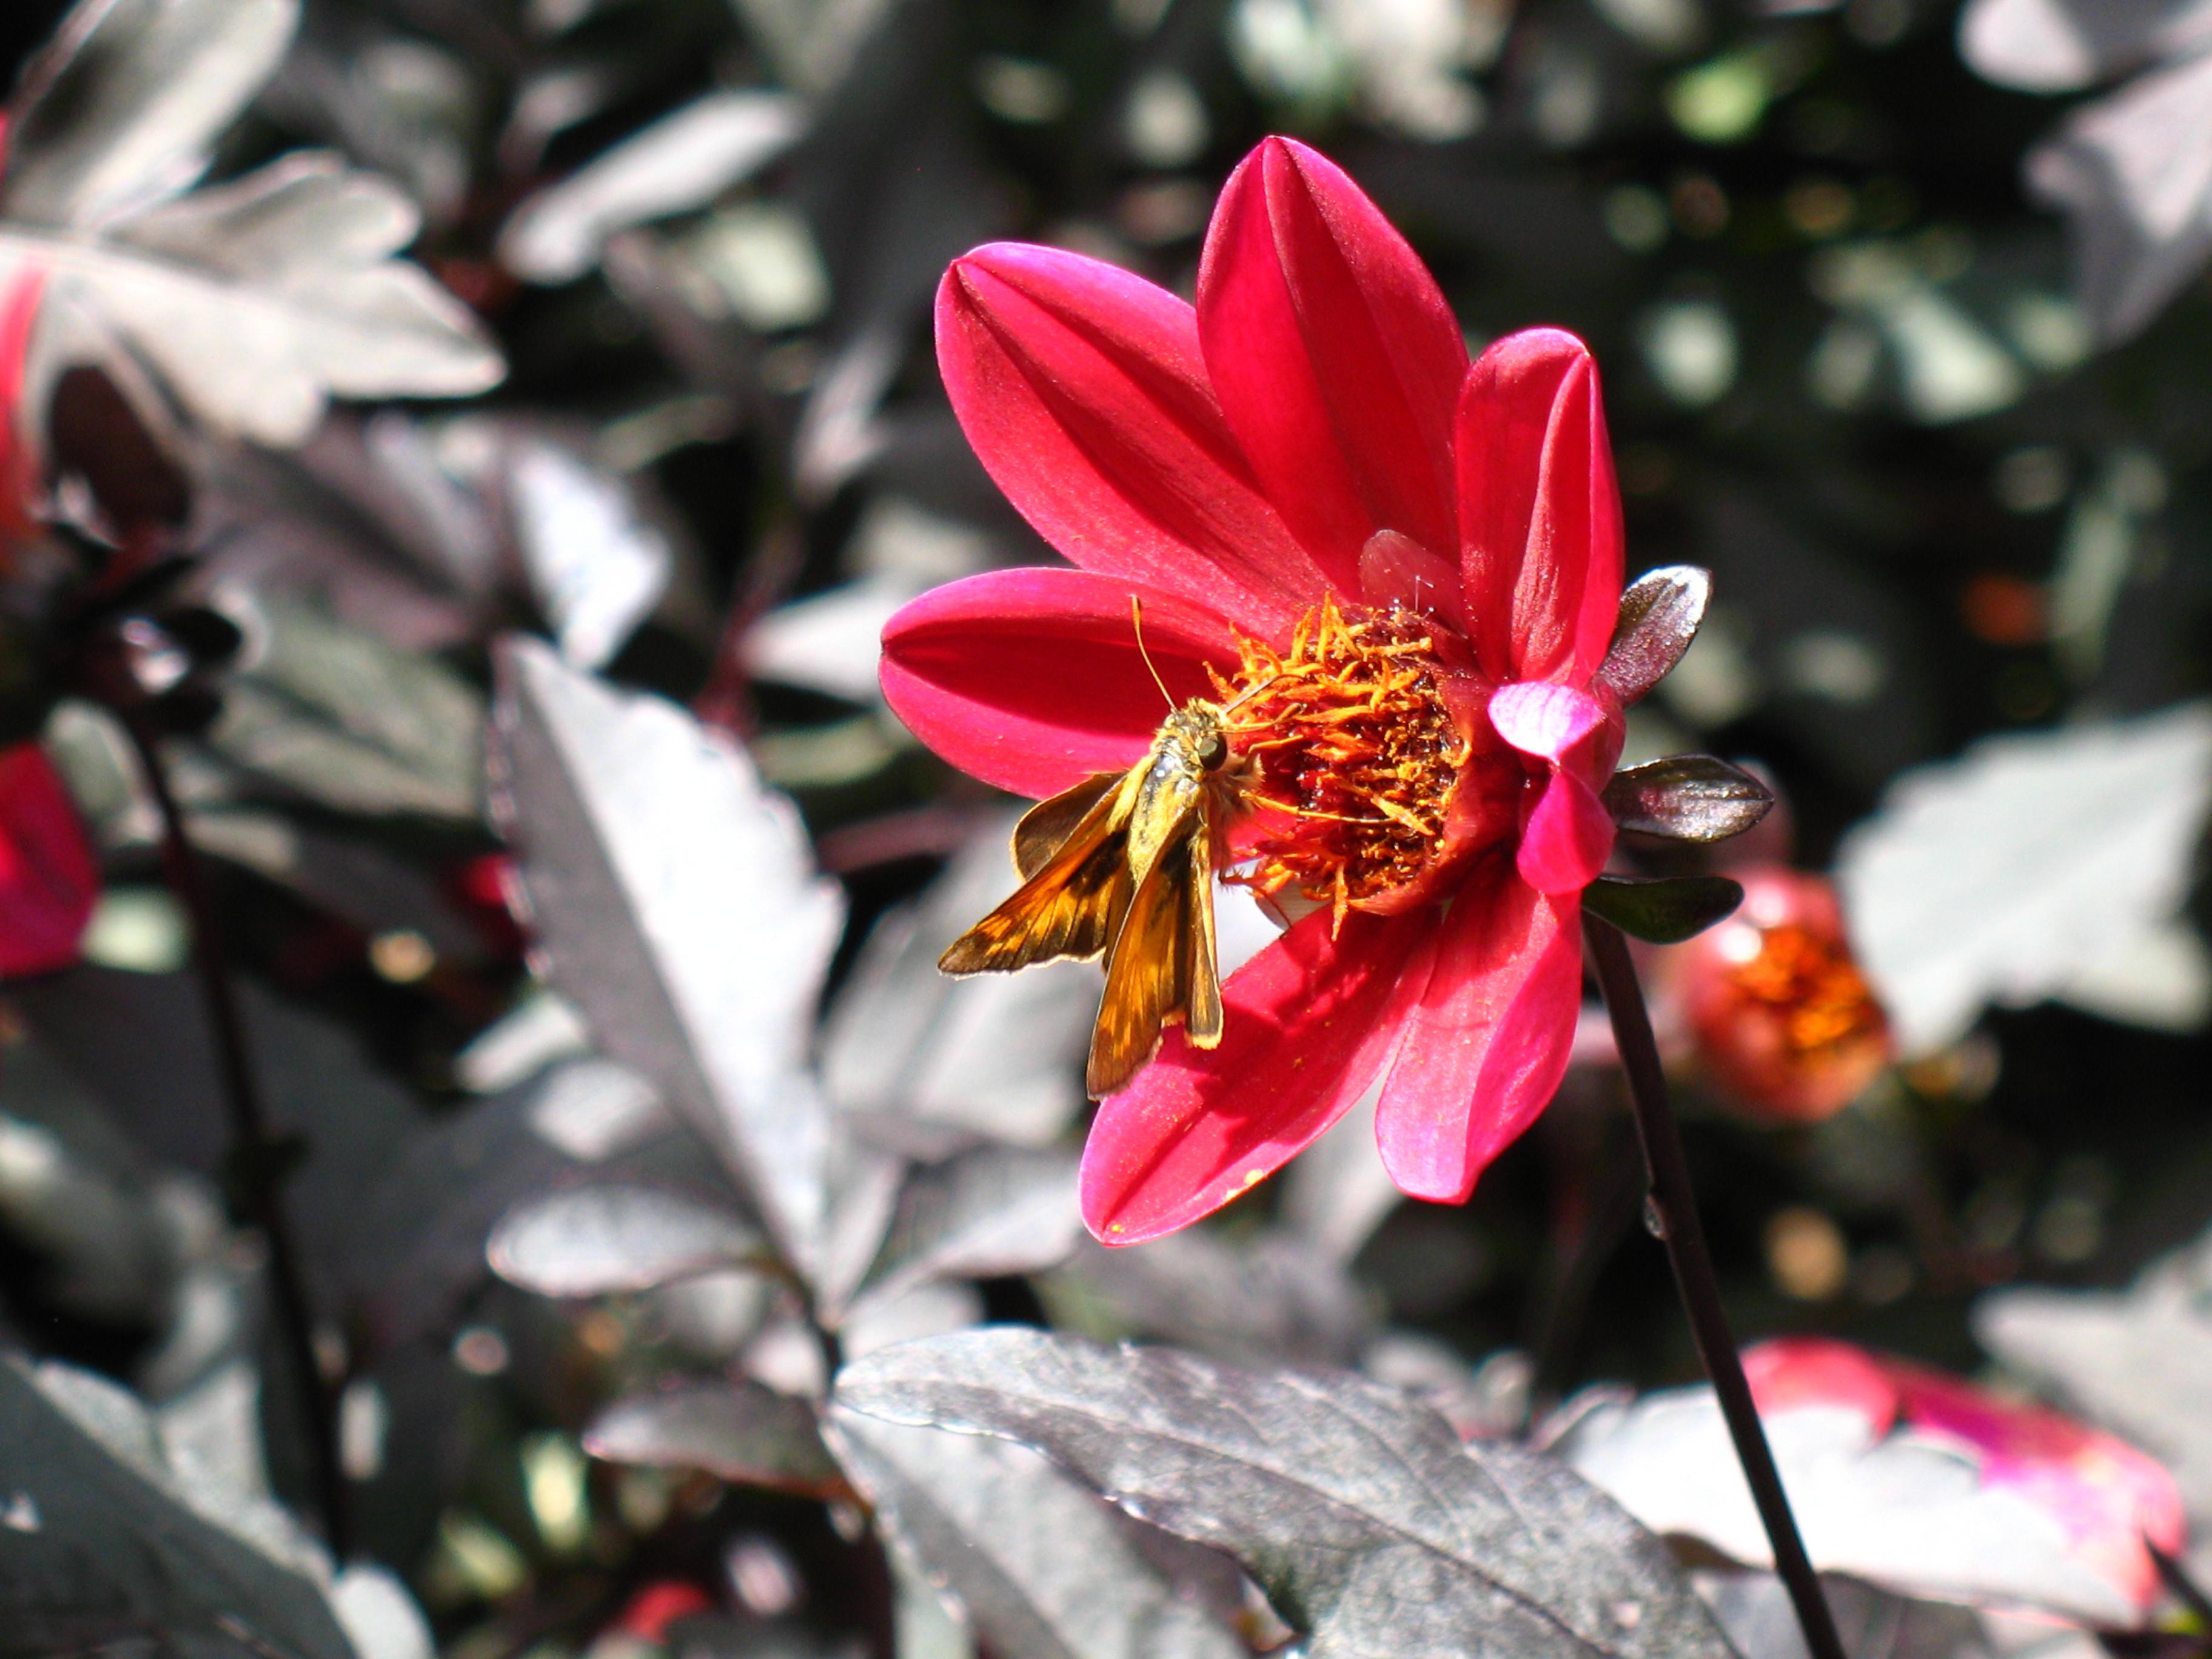 Moth on pink dahlia